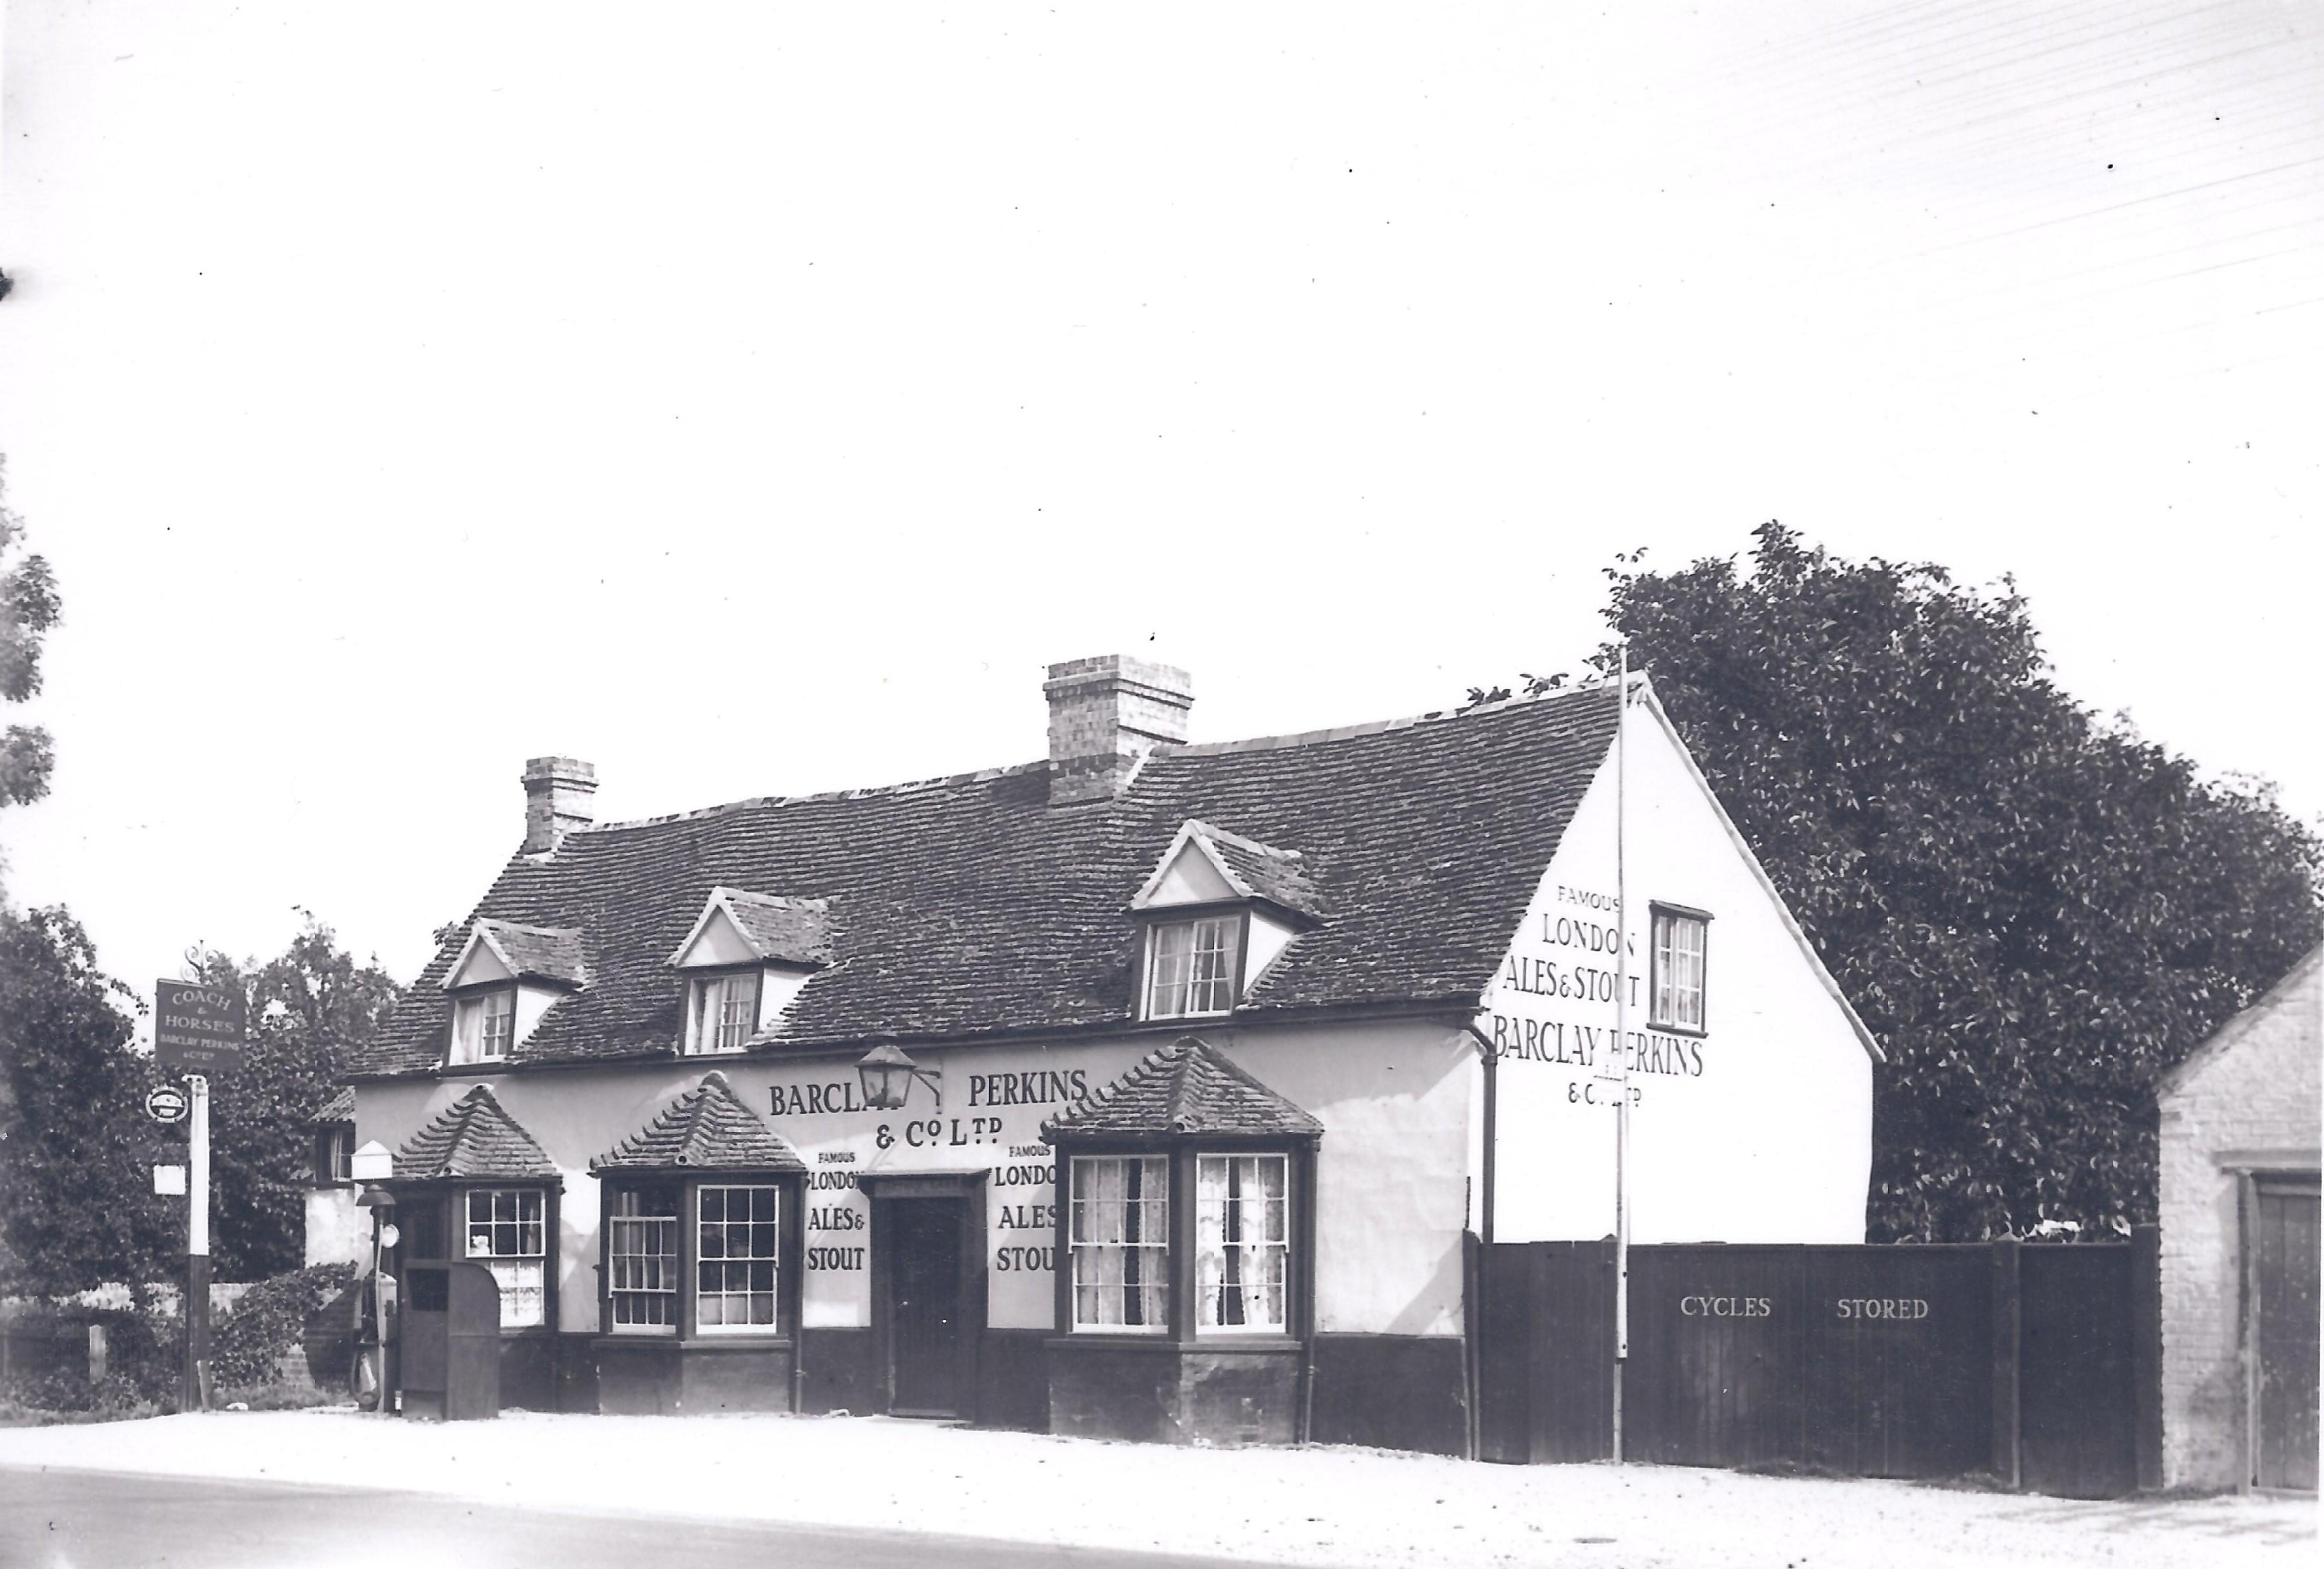 coach hideaways surrounding two cottages villages rentals hoots norfolk holiday thornham cottage